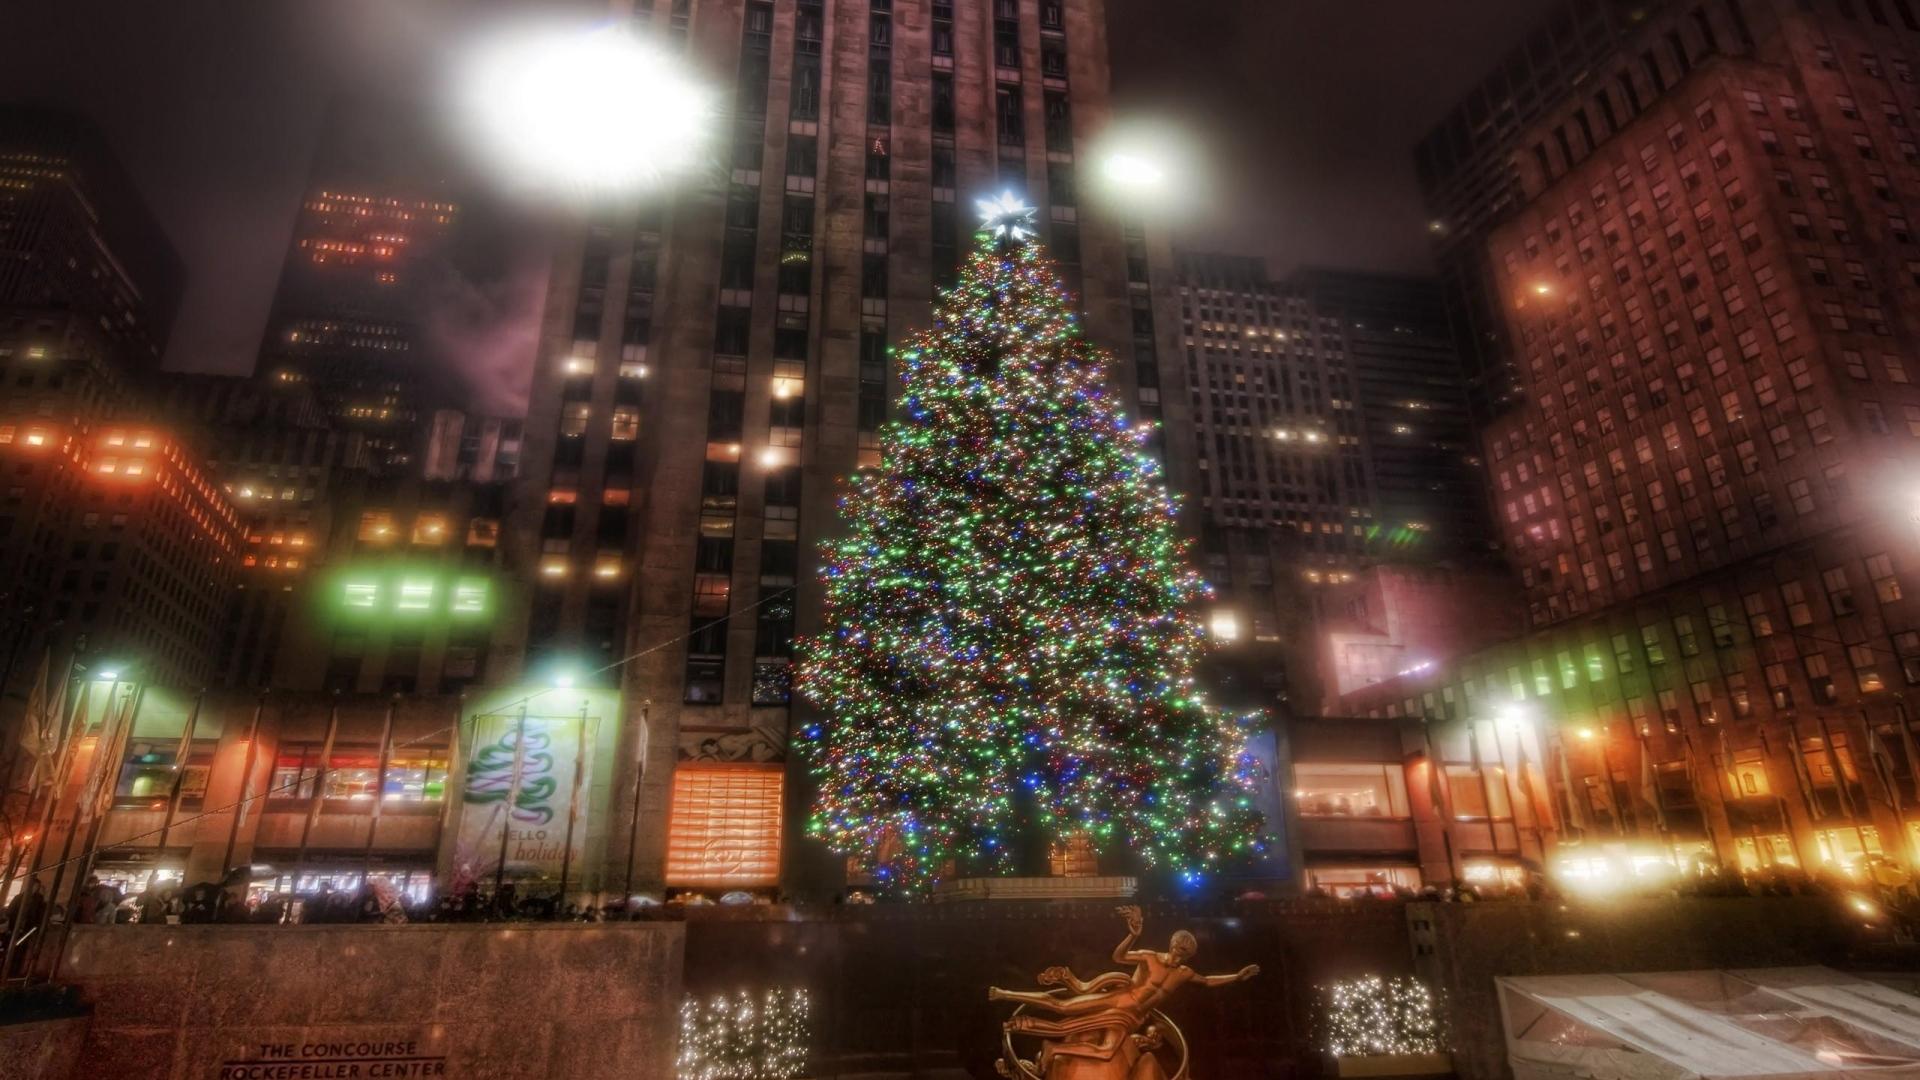 Download Wallpaper 1920x1080 Tree, Street, City, Lights